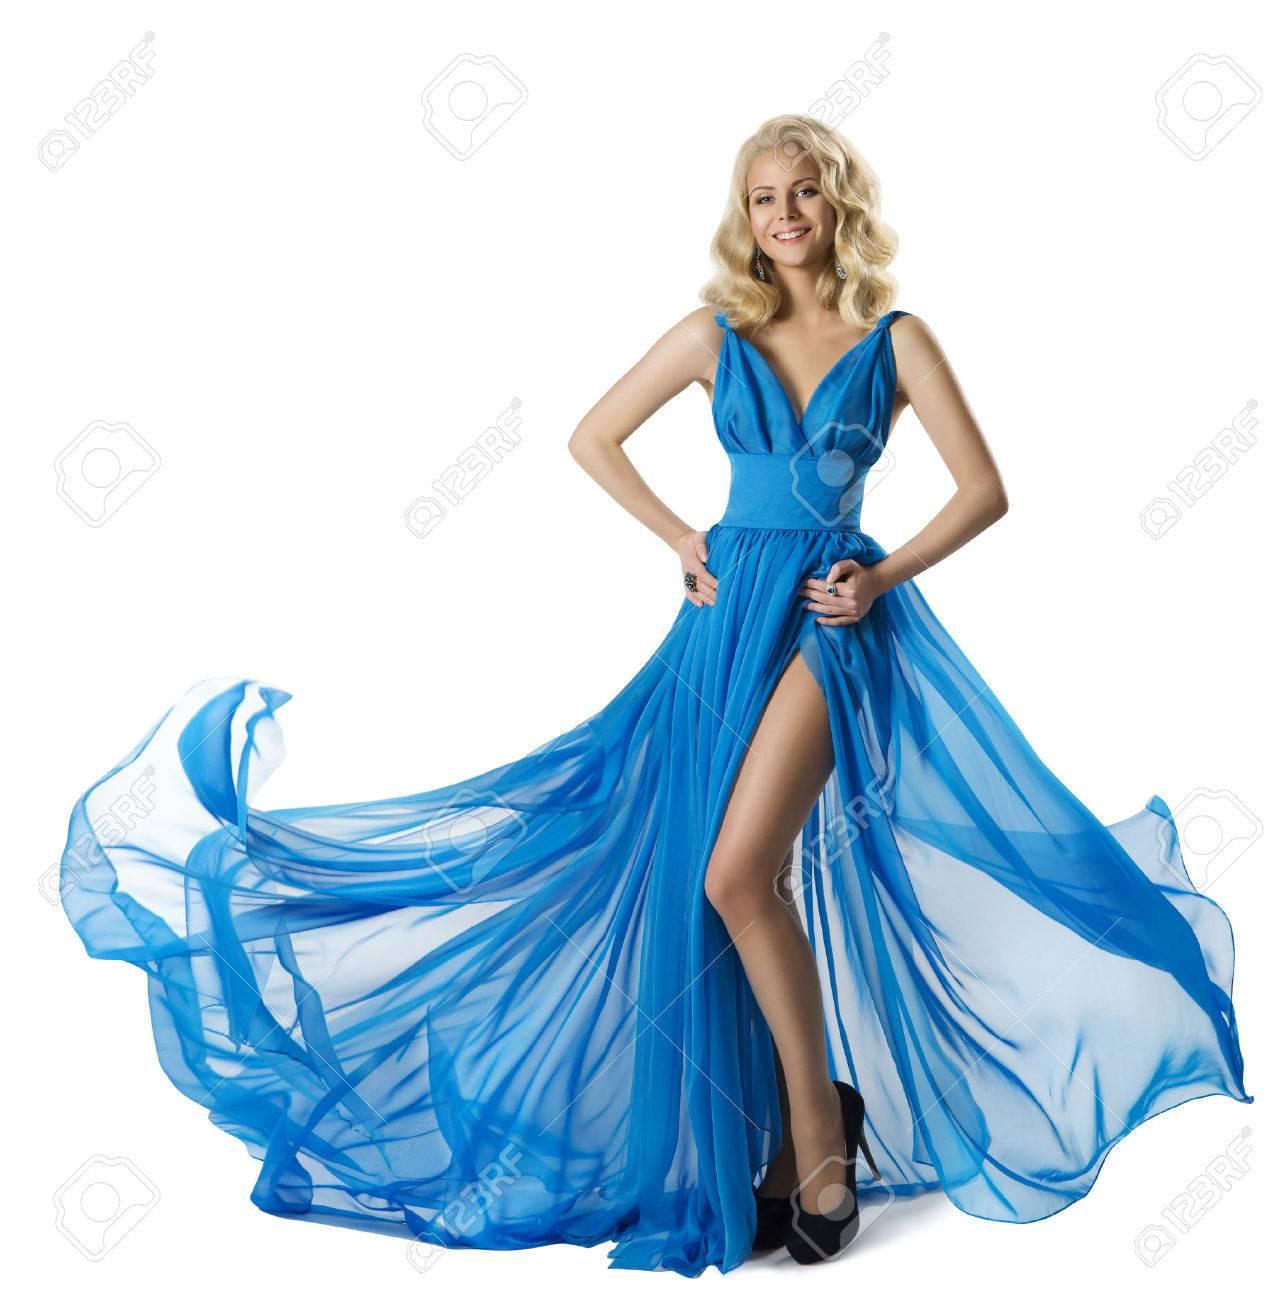 15 Schön Blaues Abendkleid Lang Stylish20 Elegant Blaues Abendkleid Lang Boutique